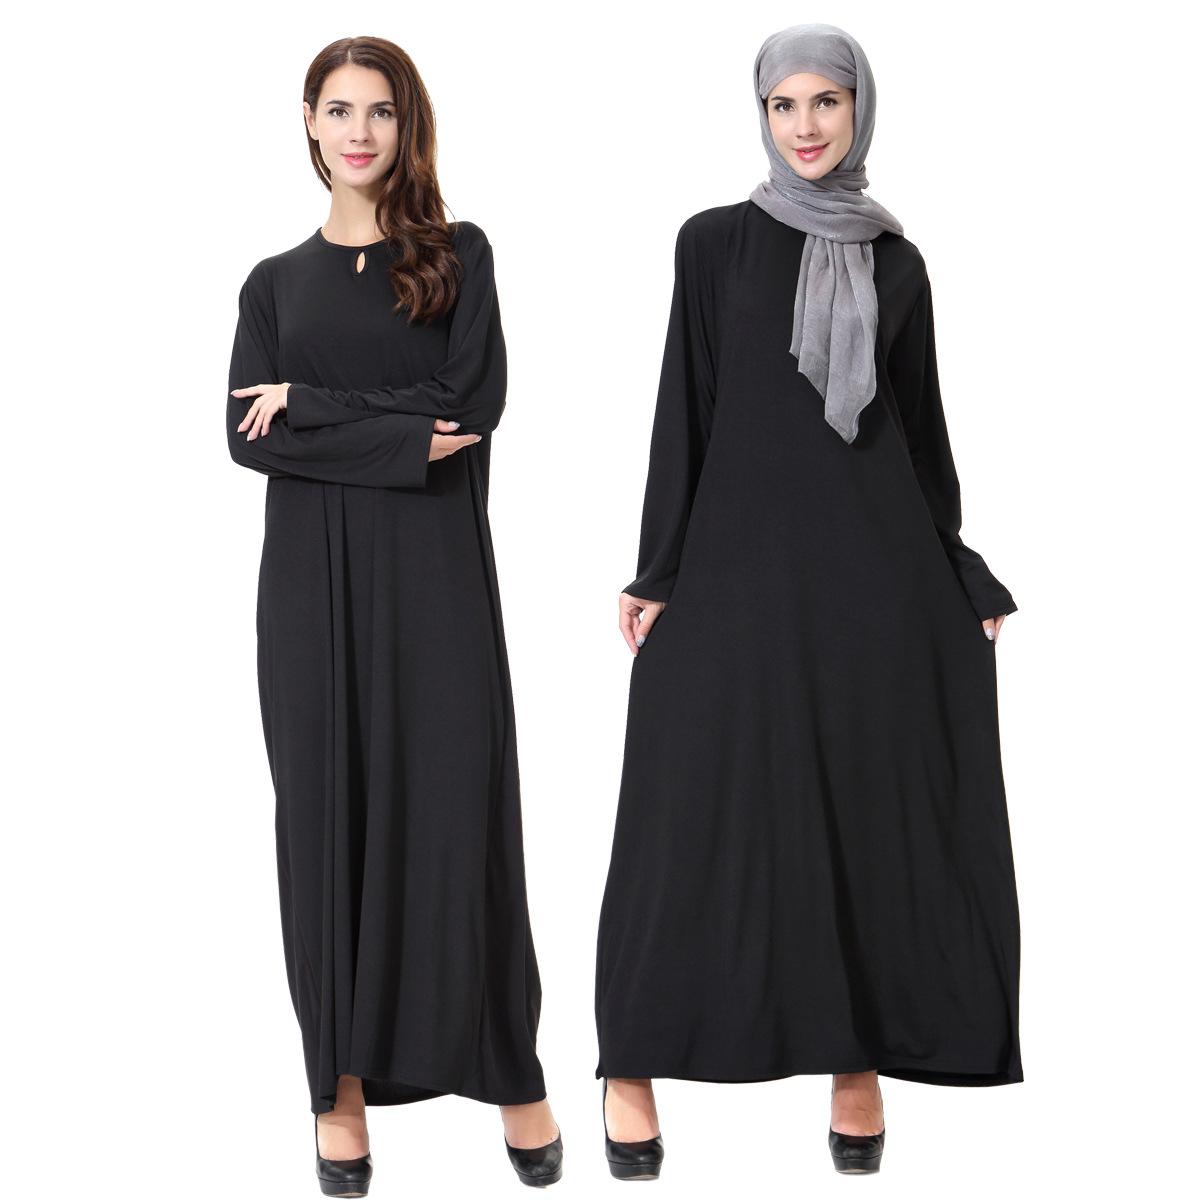 malaysia kleid online großhandel vertriebspartner, malaysia